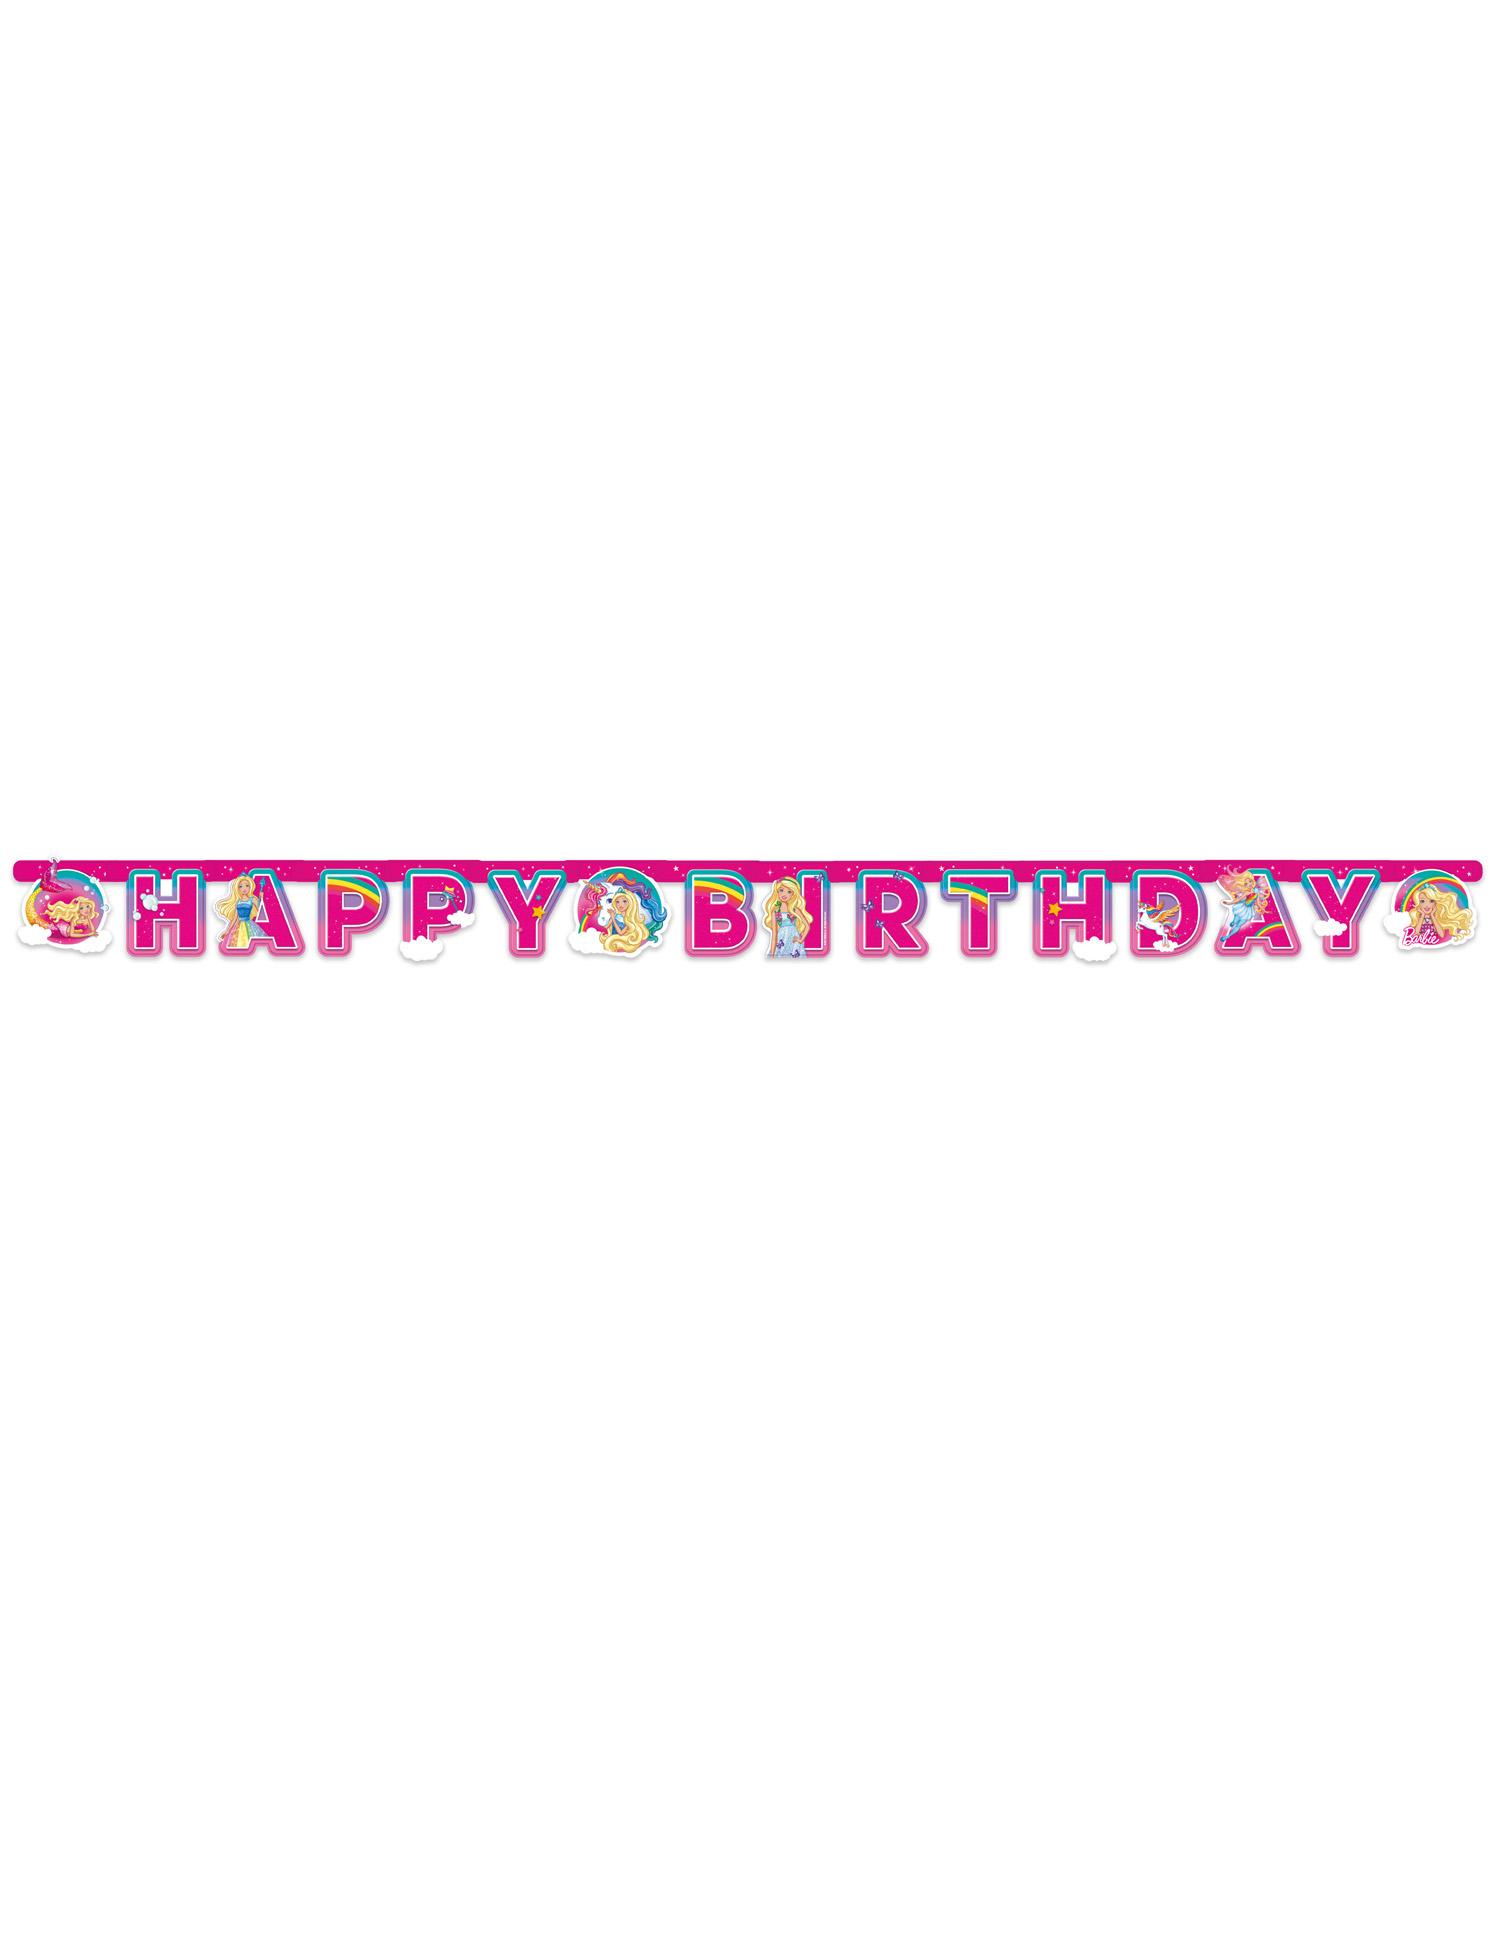 Bannière Happy Birthday Barbie Dreamtopia